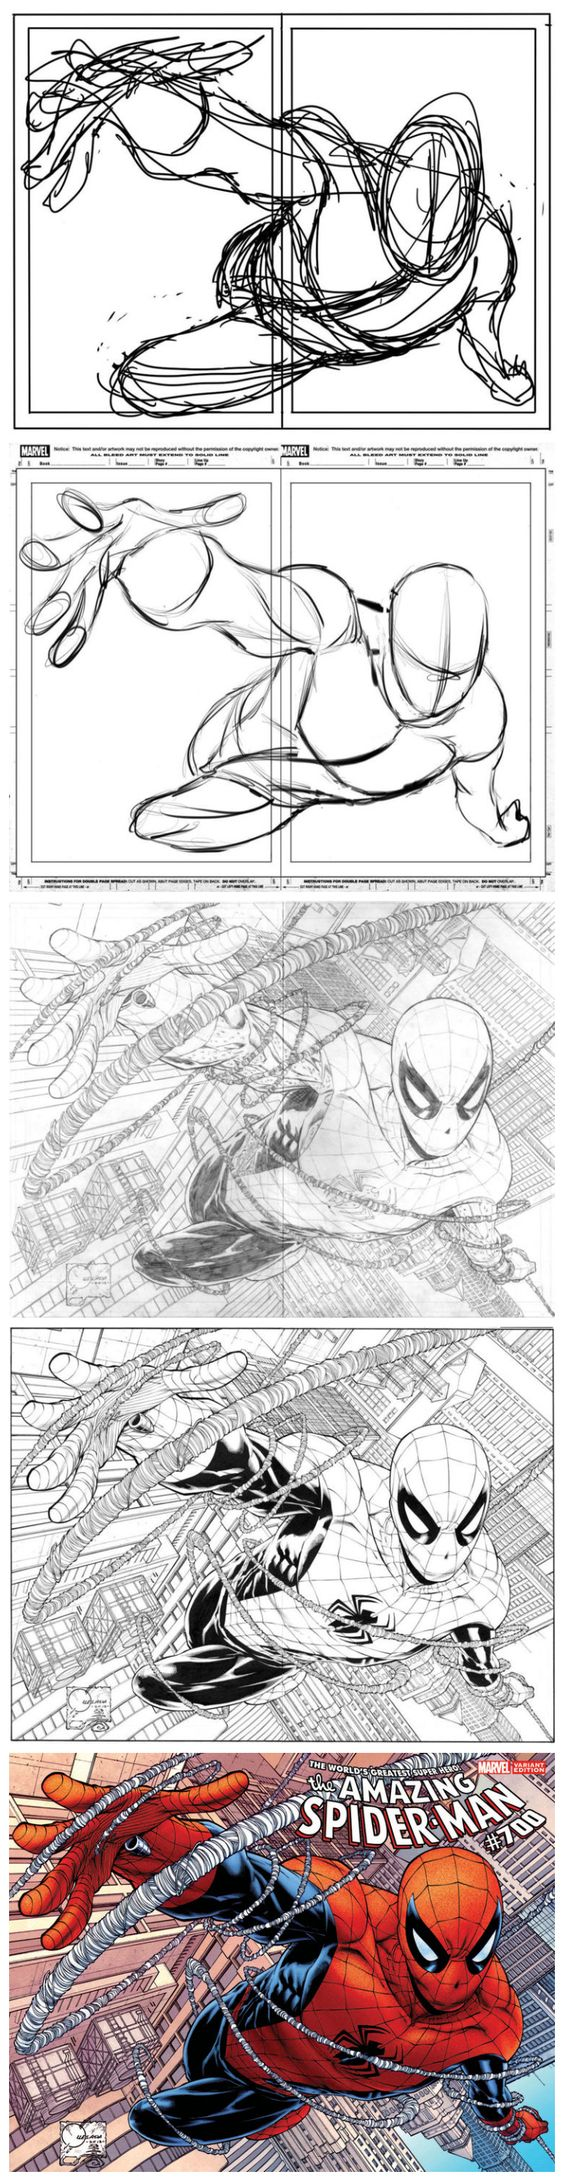 Spider-Man by Joe Quesada #CharacterDesignReference...genial